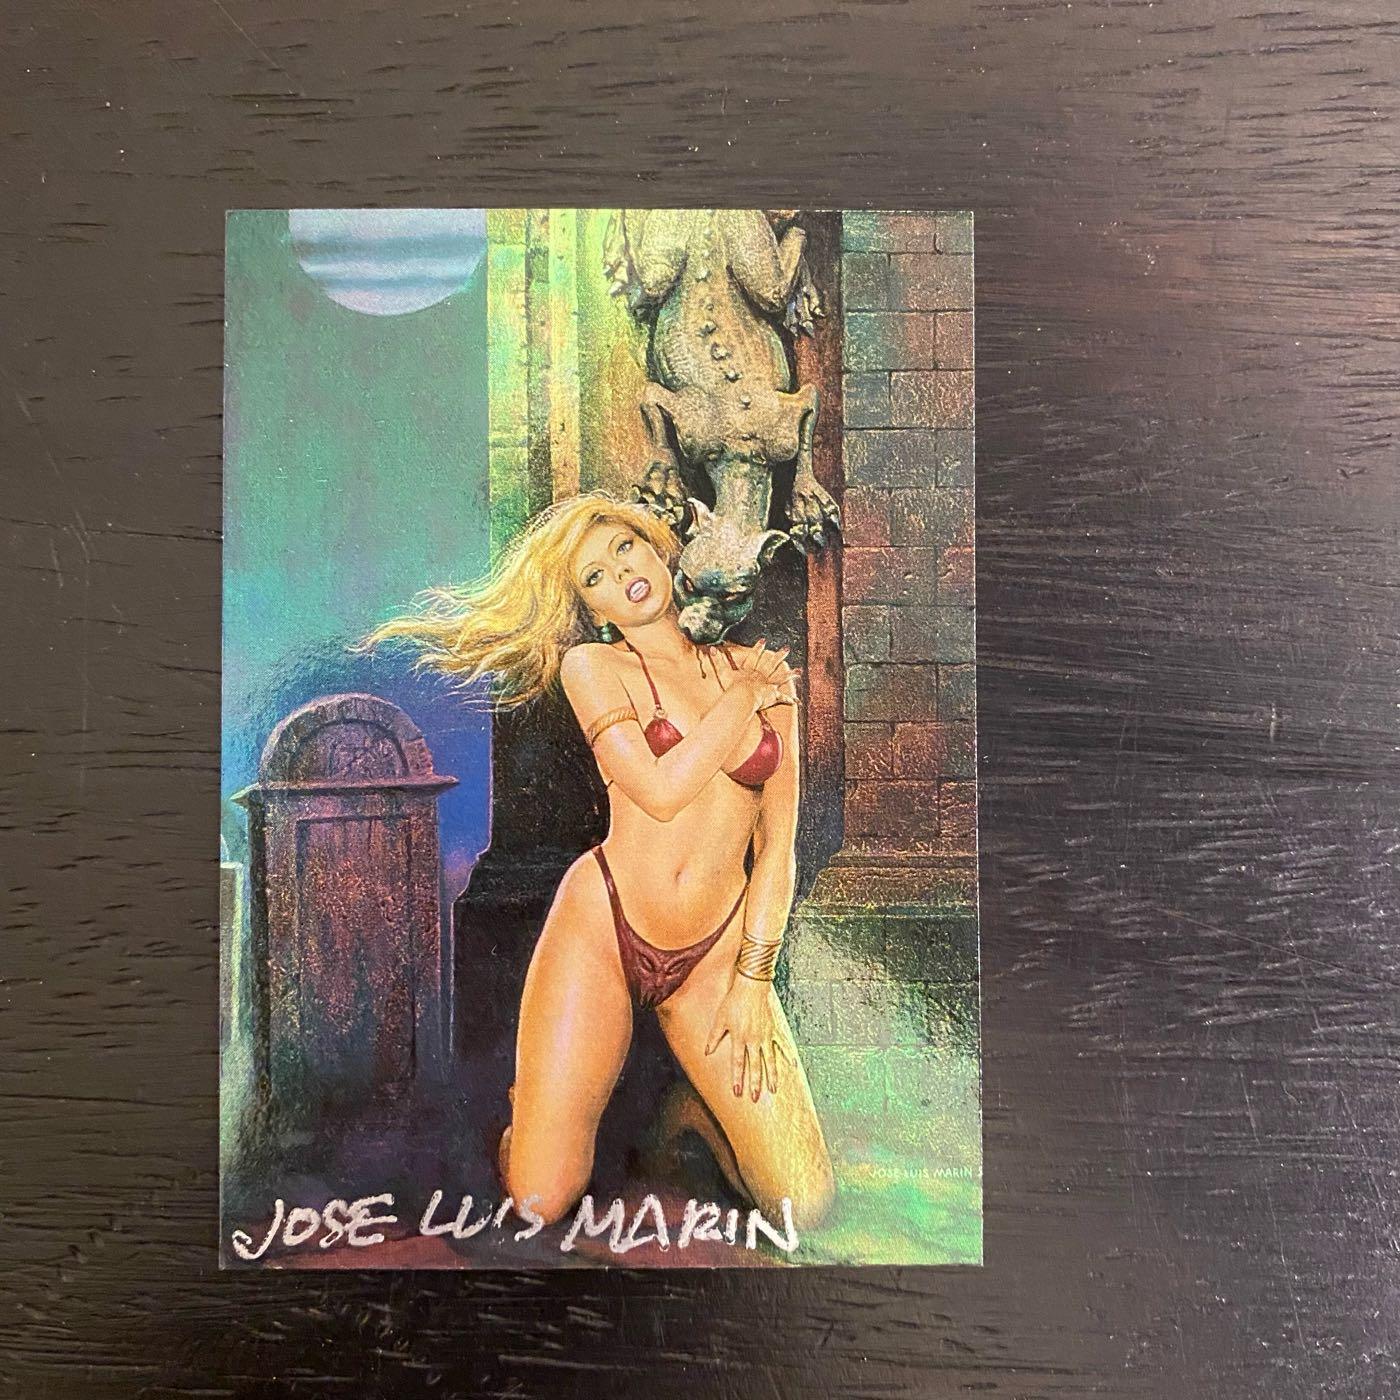 1998 Jose Luis Marin comic images 親筆簽名 收藏卡 卡片